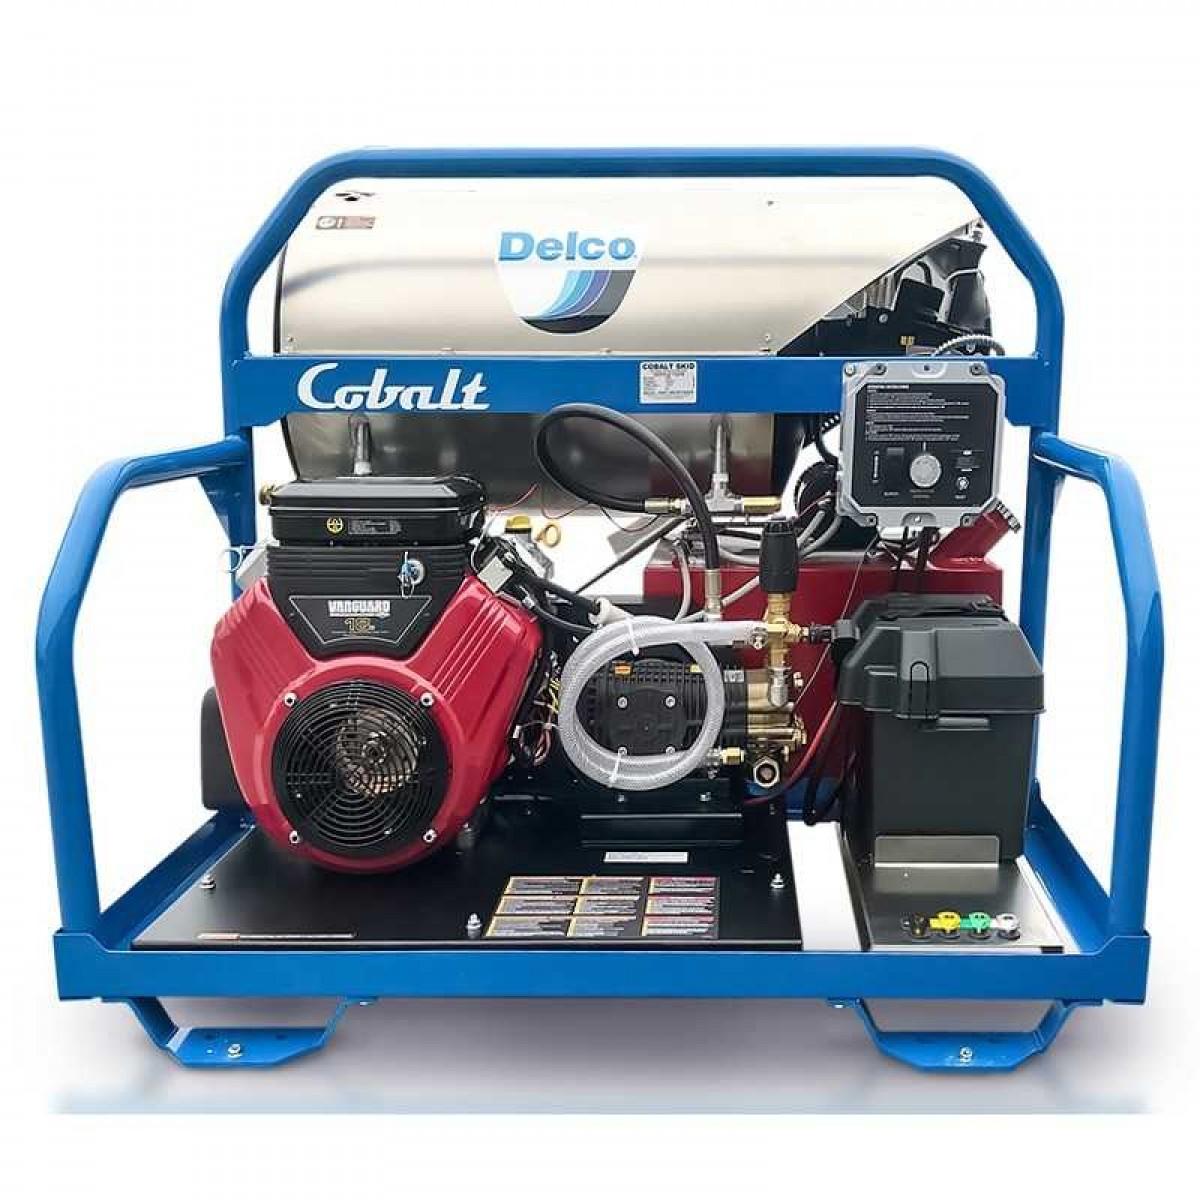 honda atv ignition switch wiring diagram honda gx630 ignition switch delco cobalt 65004 4000 psi honda gx630 gas engine diesel